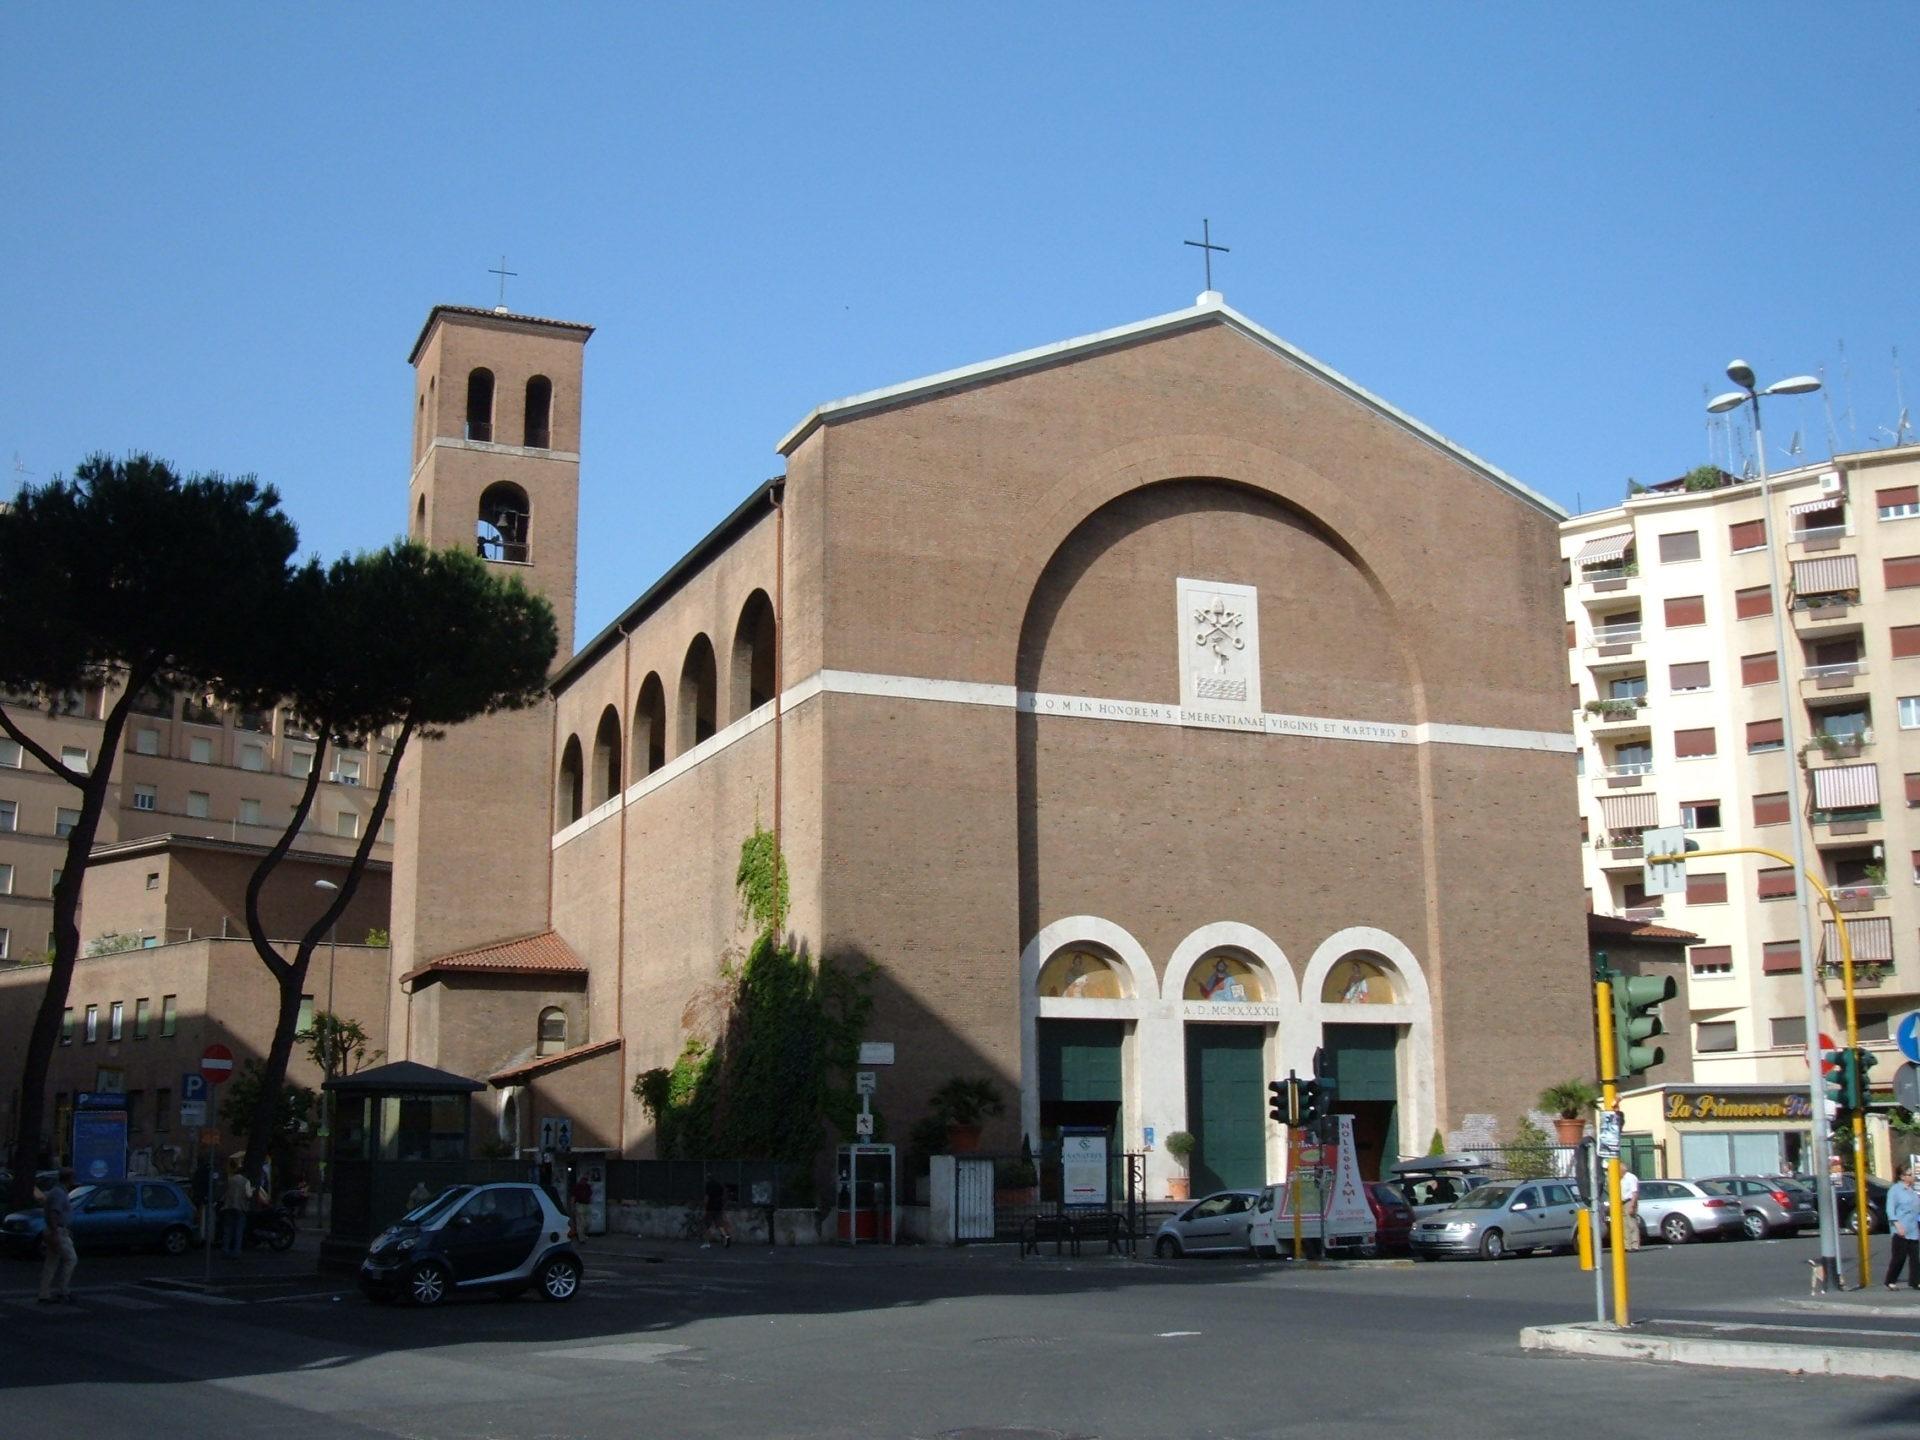 Ecolodge Roma - Sant'Emerenziana - Viale Eritrea